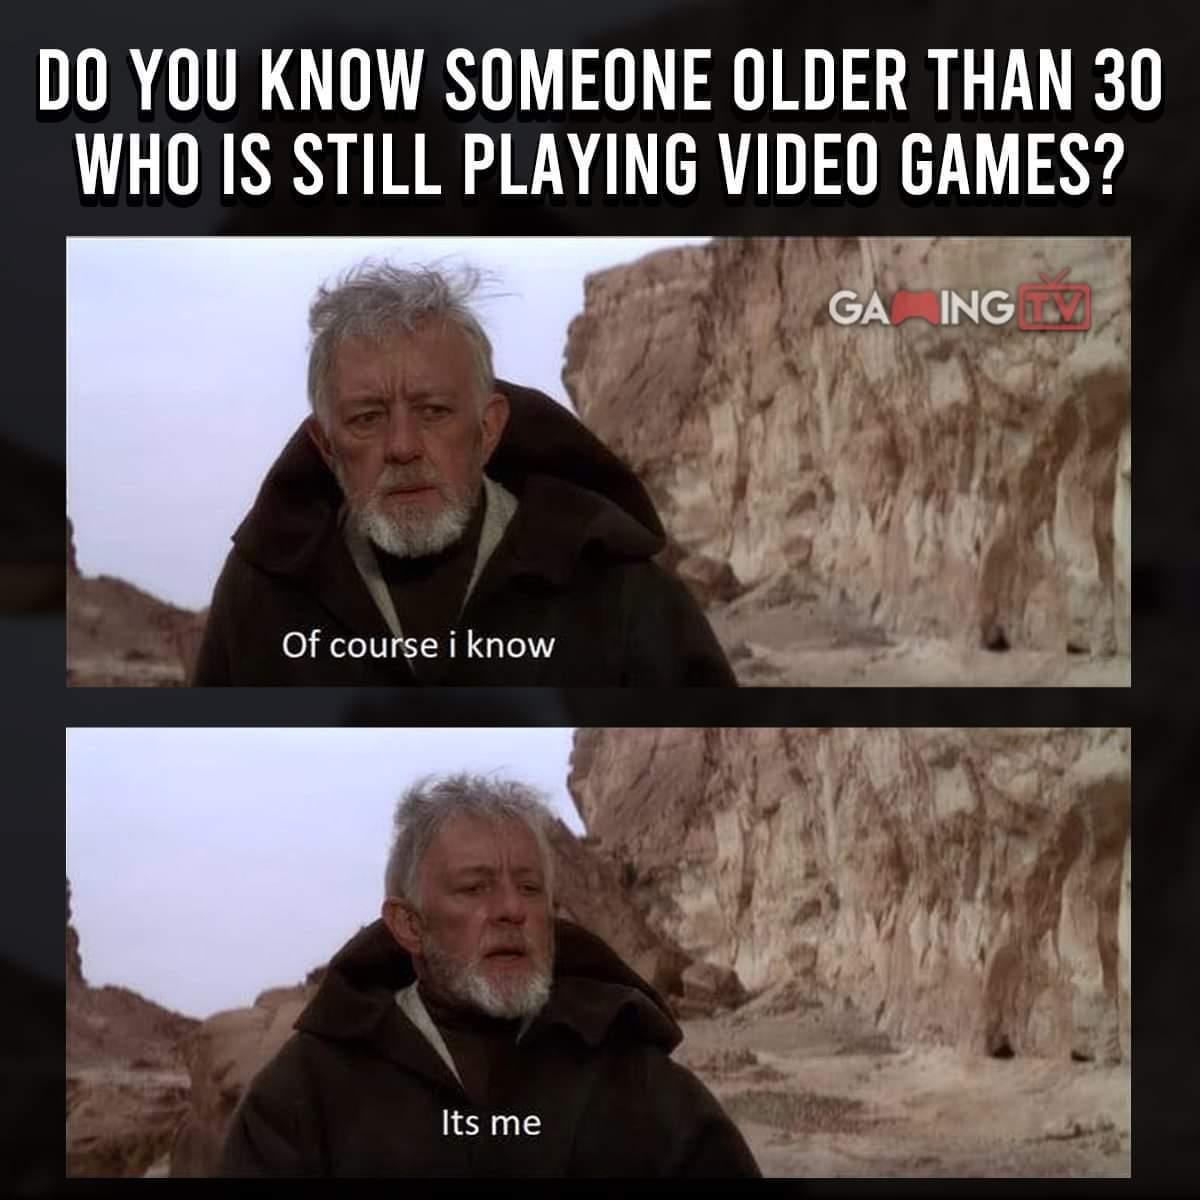 I'm turning 25 Oct 9th so this isn't me ...... Yet - meme